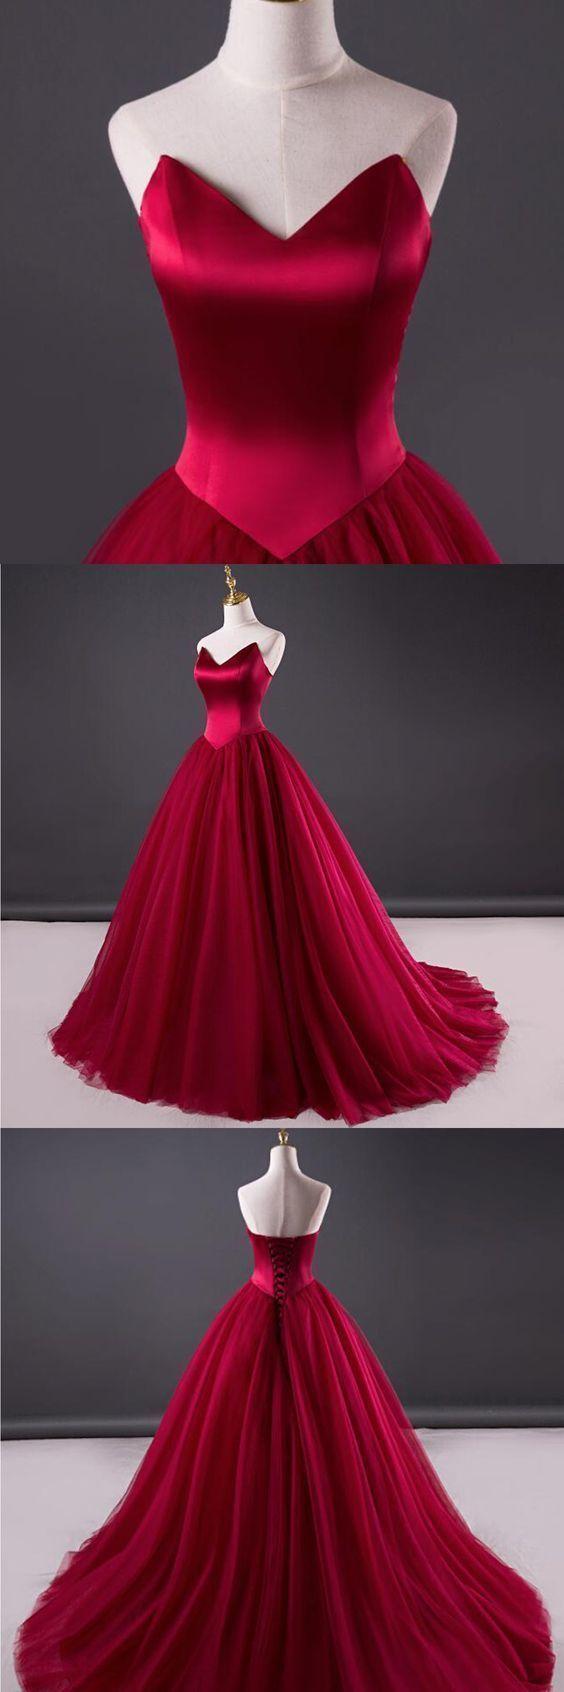 Prom Dresses,Wine Red Prom Dress,New Prom by prom dresses on Zibbet